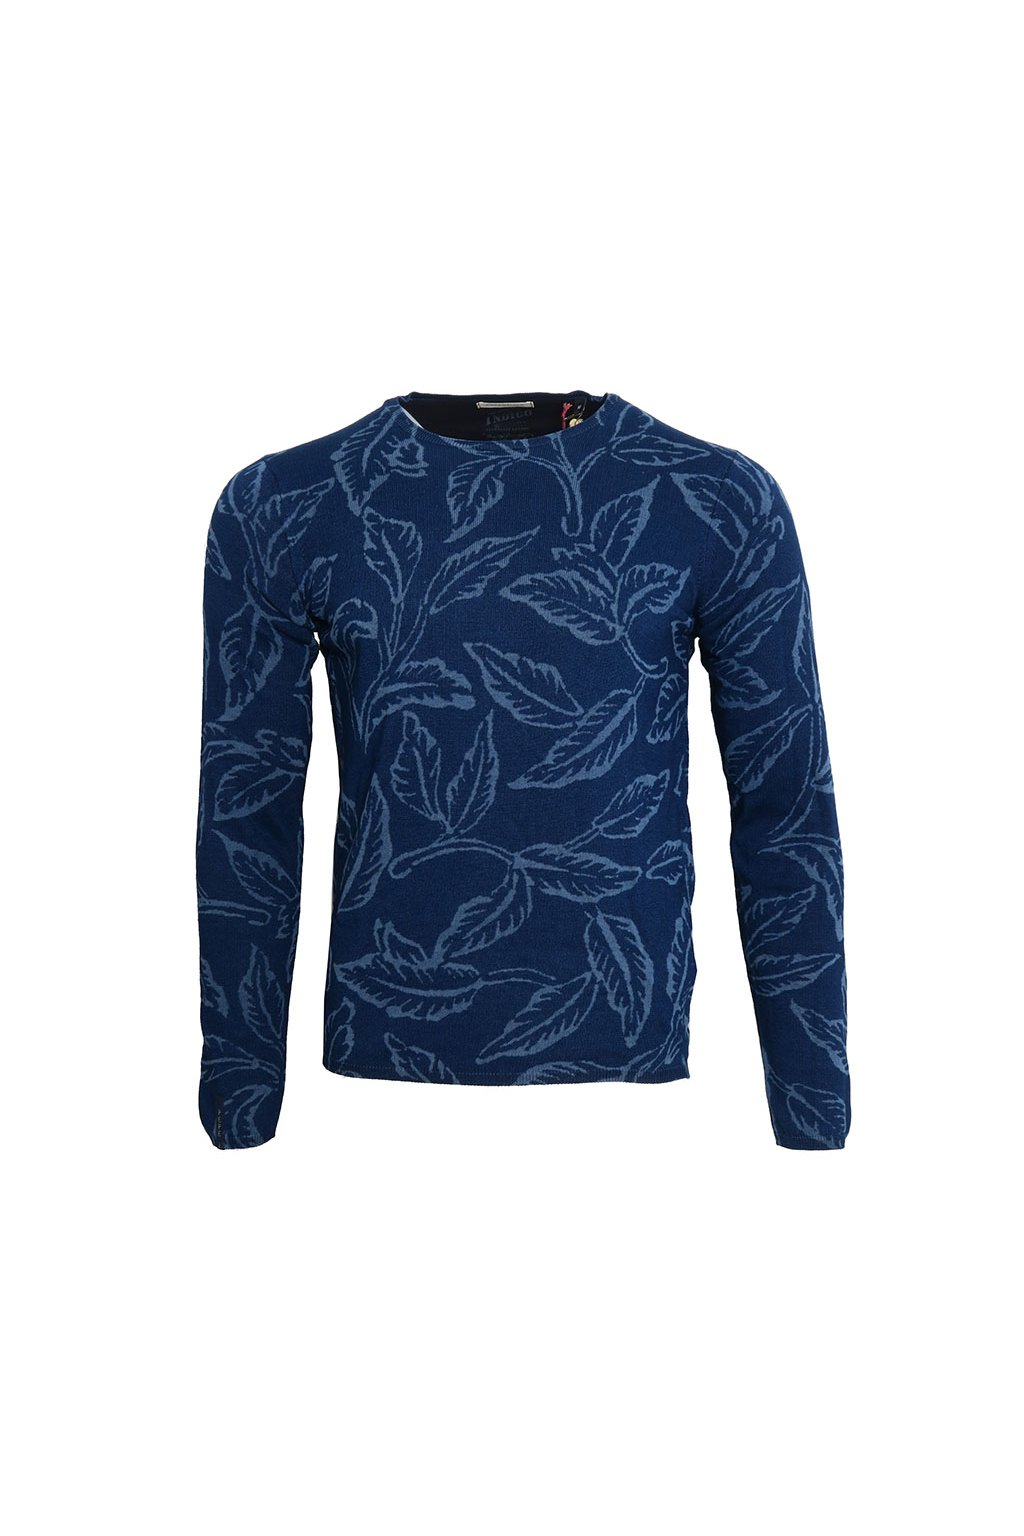 Květovaný modrý svetr Pepe Jeans